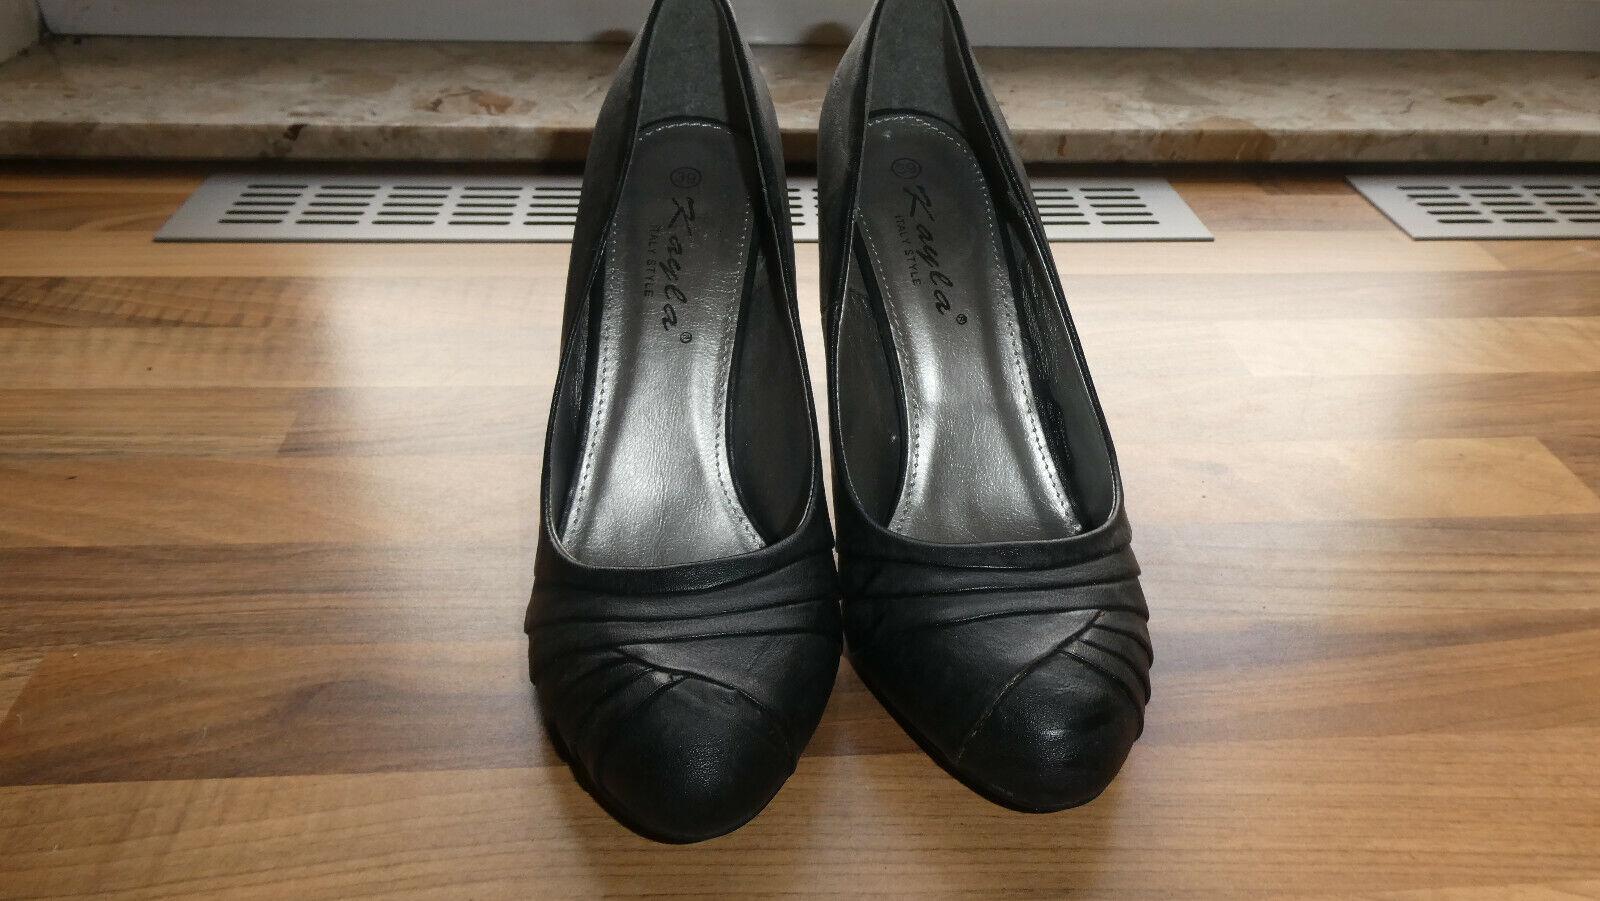 Tanzschuh Damen Schuhe schwarz Gr. 39 sehr elegant neu ohne Karton Modell Kayla